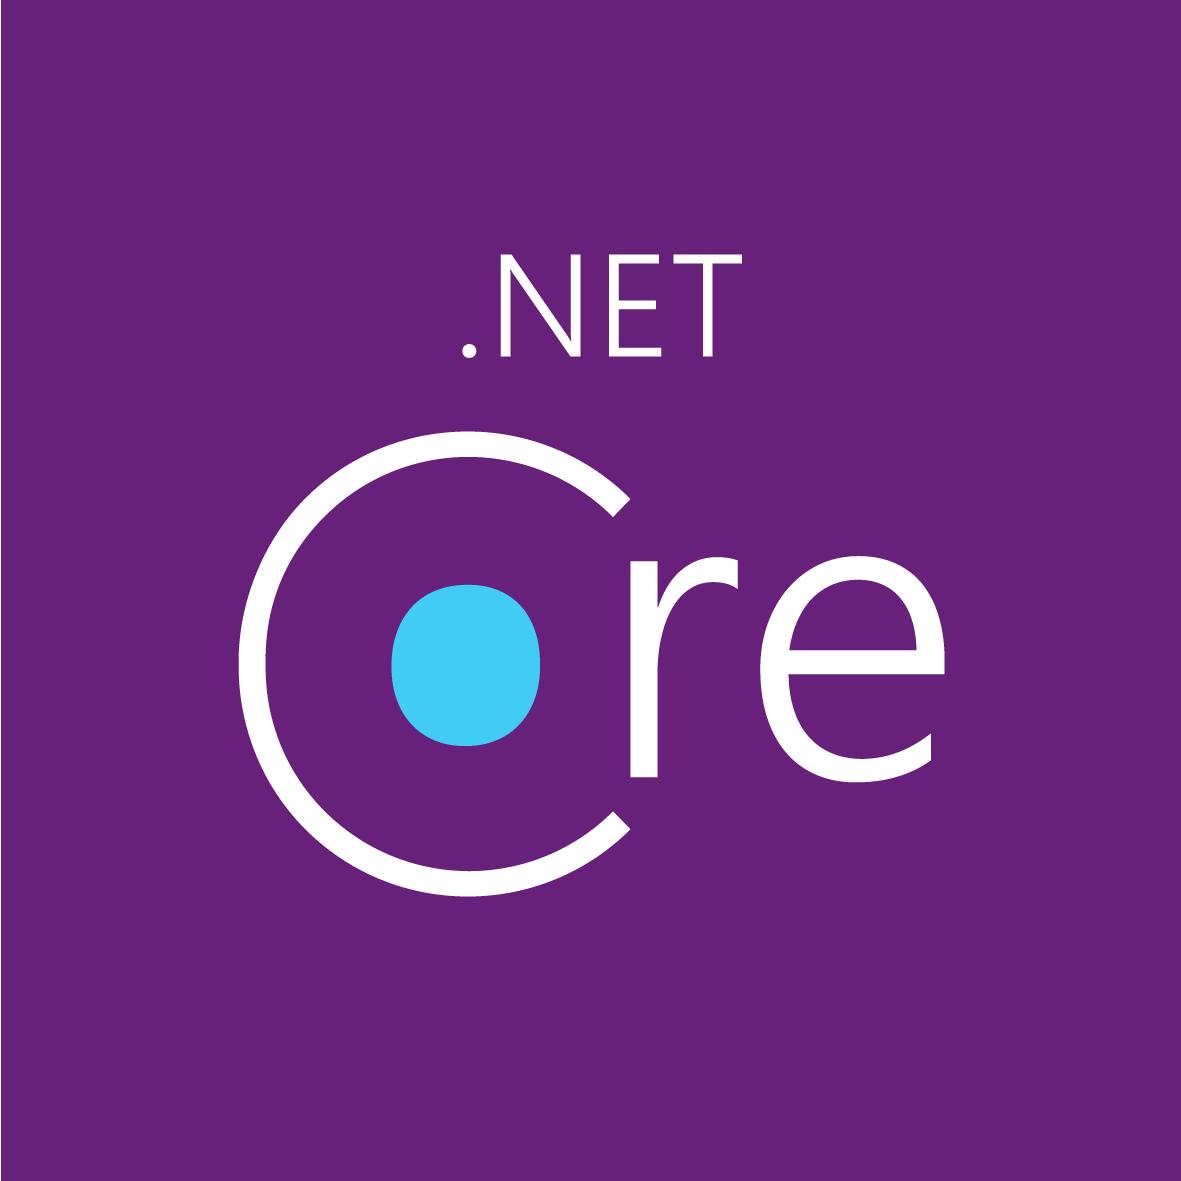 https://raw.githubusercontent.com/campusMVP/dotnetCoreLogoPack/master/.NET%20Core/Bitmap%20RGB/Bitmap-BIG_NET-Core-Logo_2colors_Square_Boxed_RGB.png